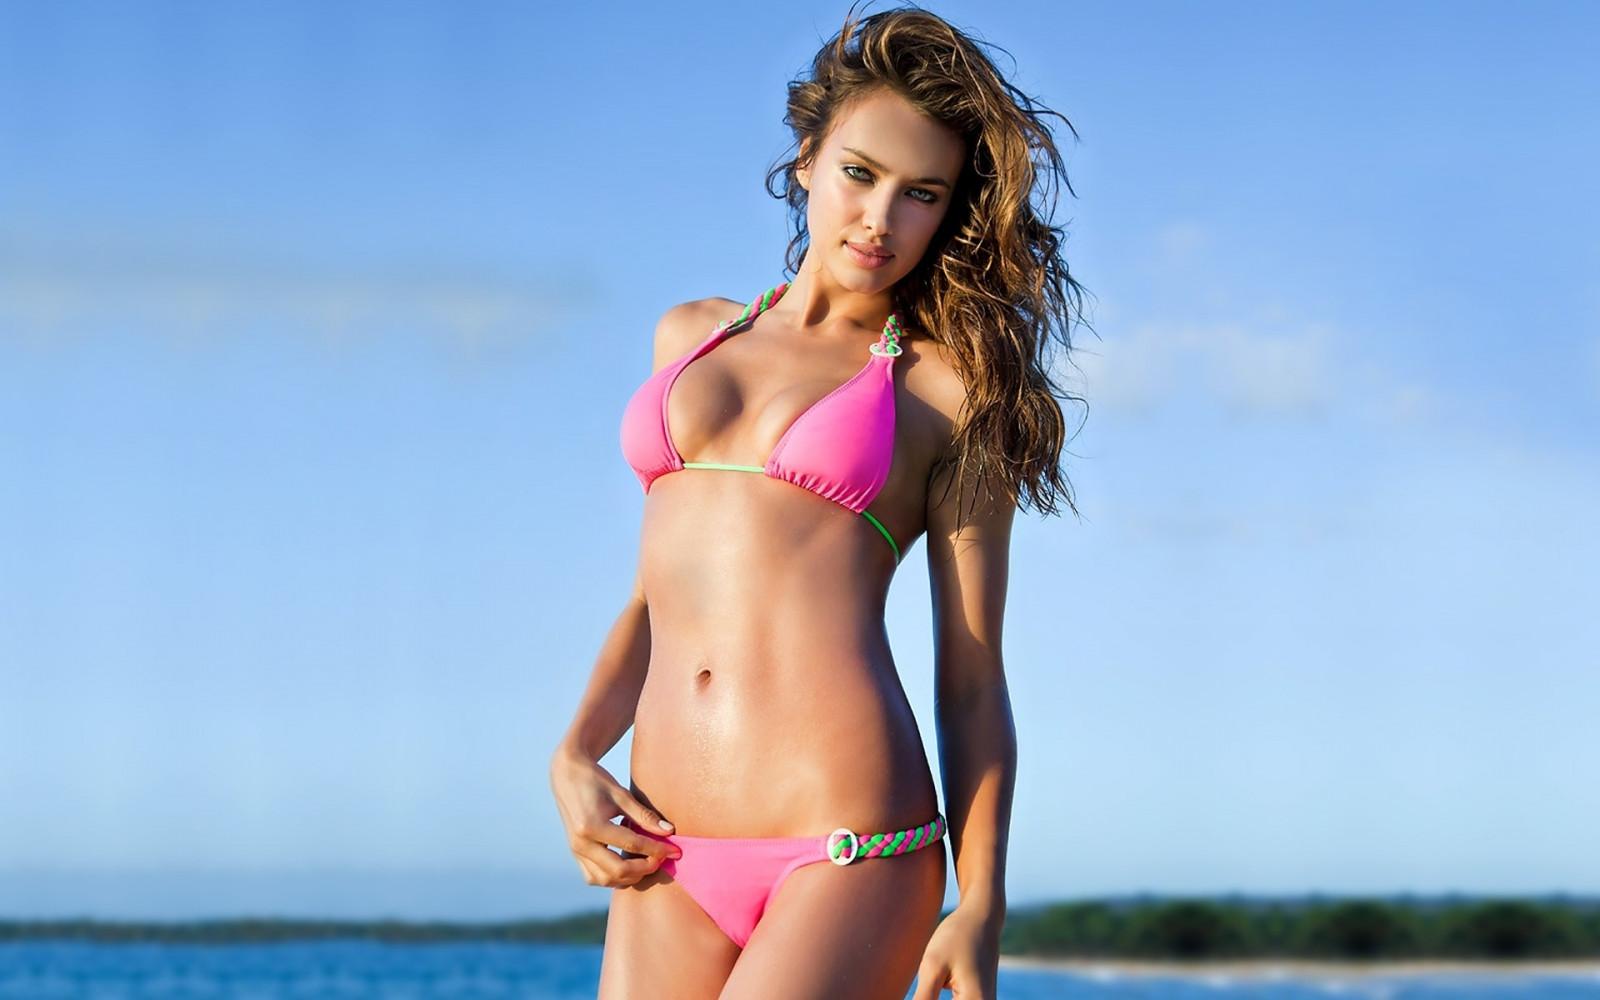 kucheryavaya-telka-v-rozovih-bikini